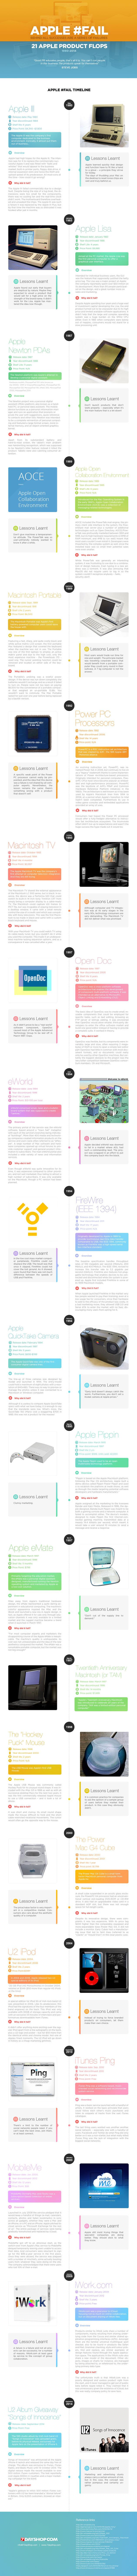 Apple Fail Infographic